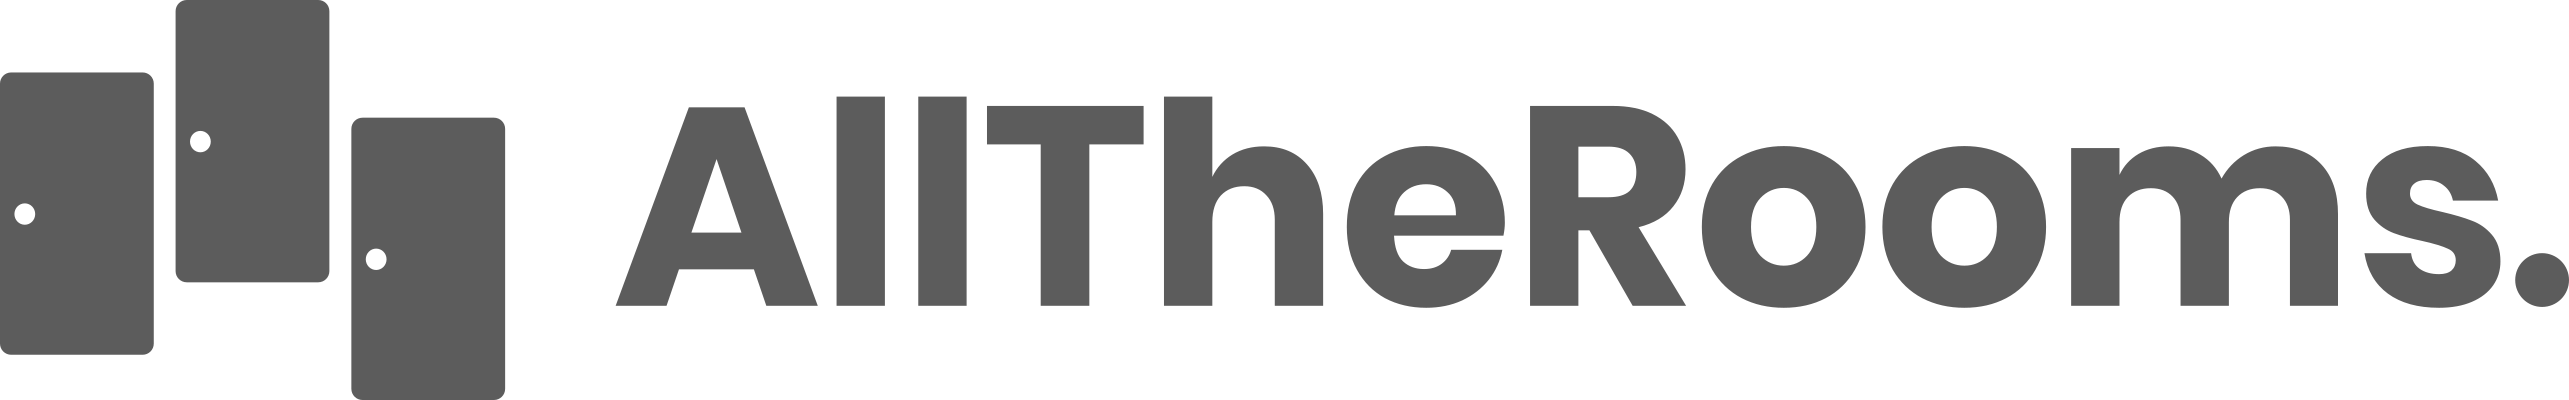 AllTheRooms logo 2